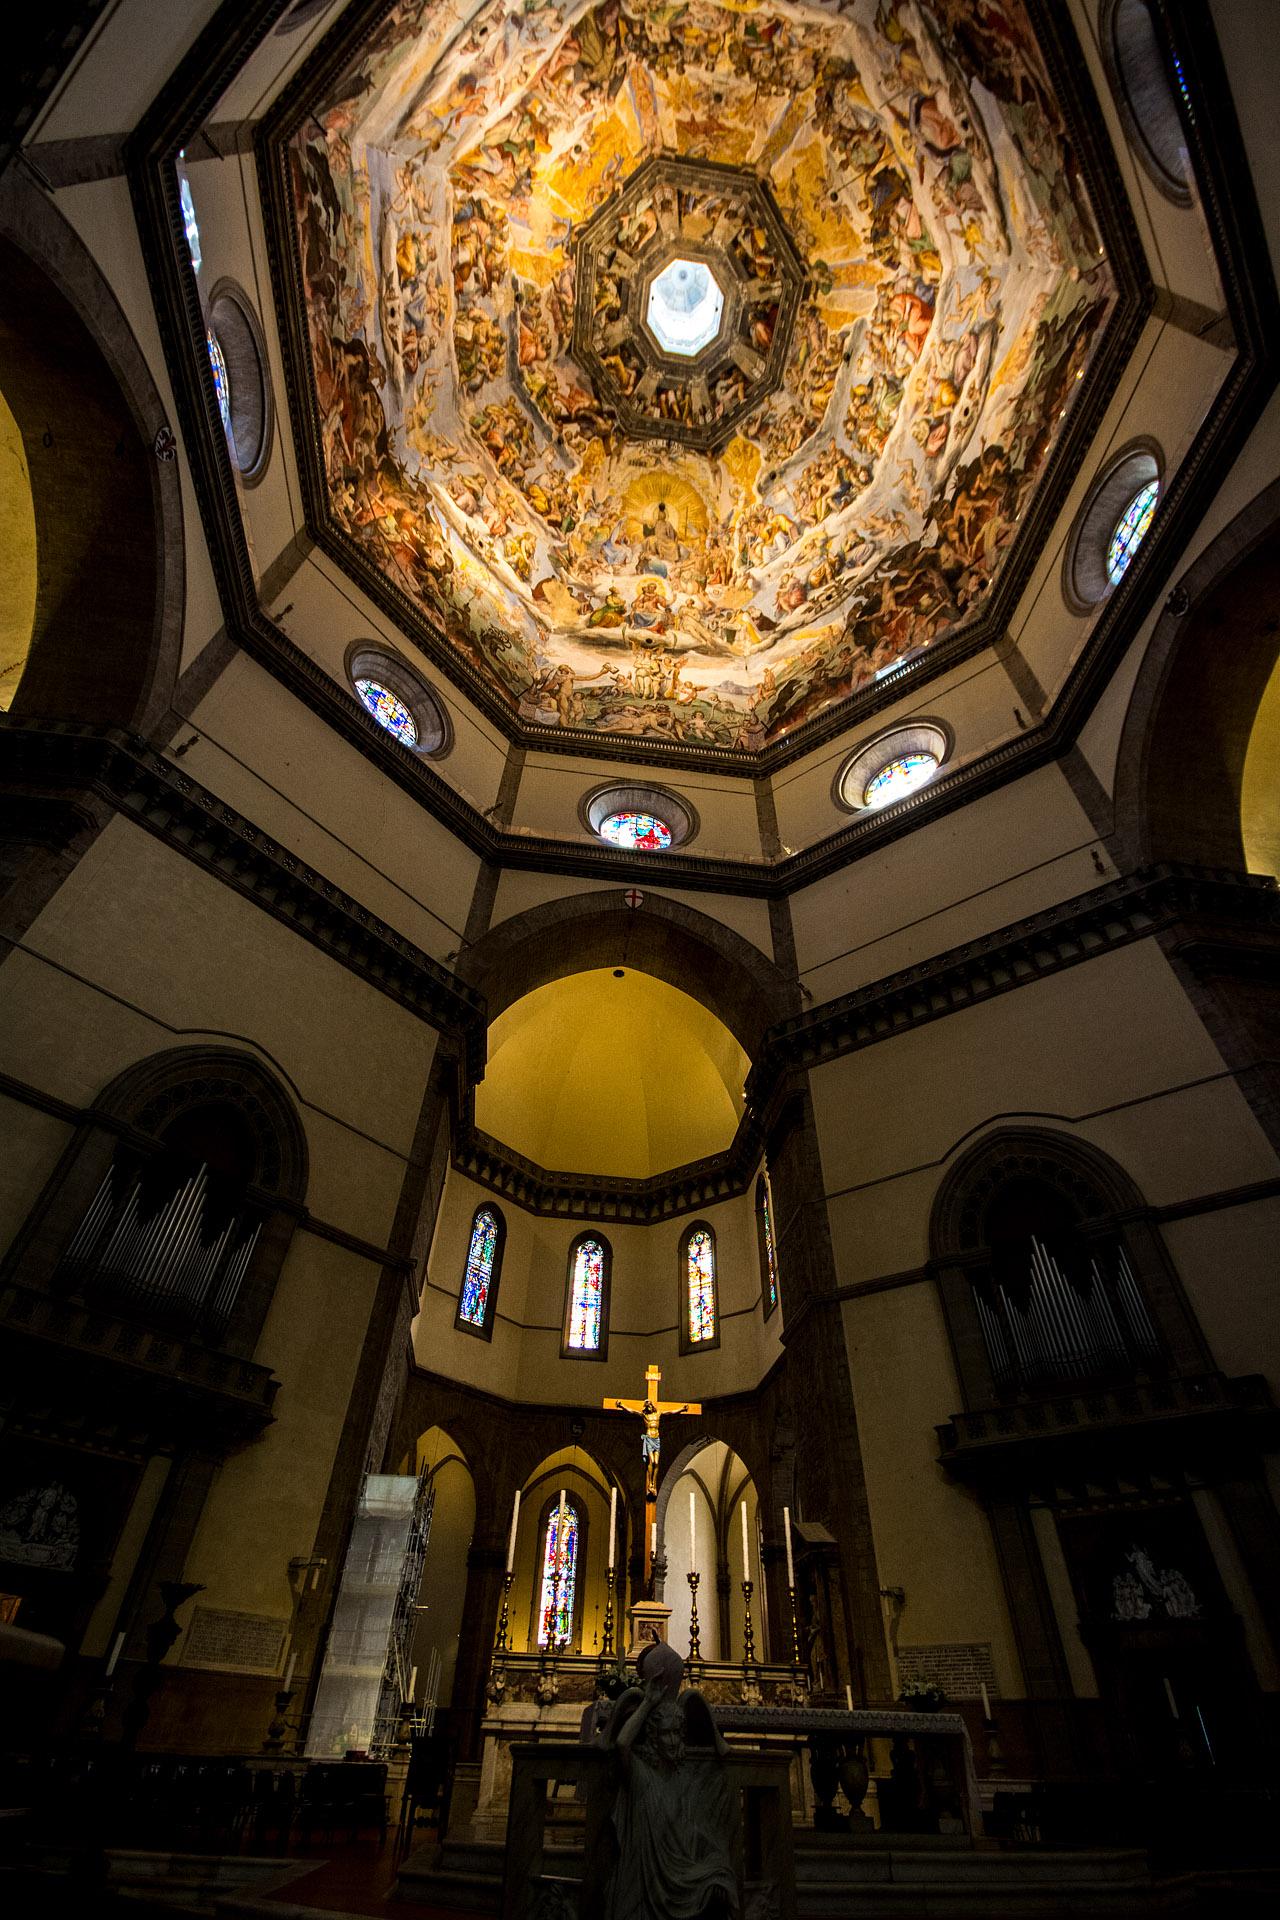 The Duomo (interior)